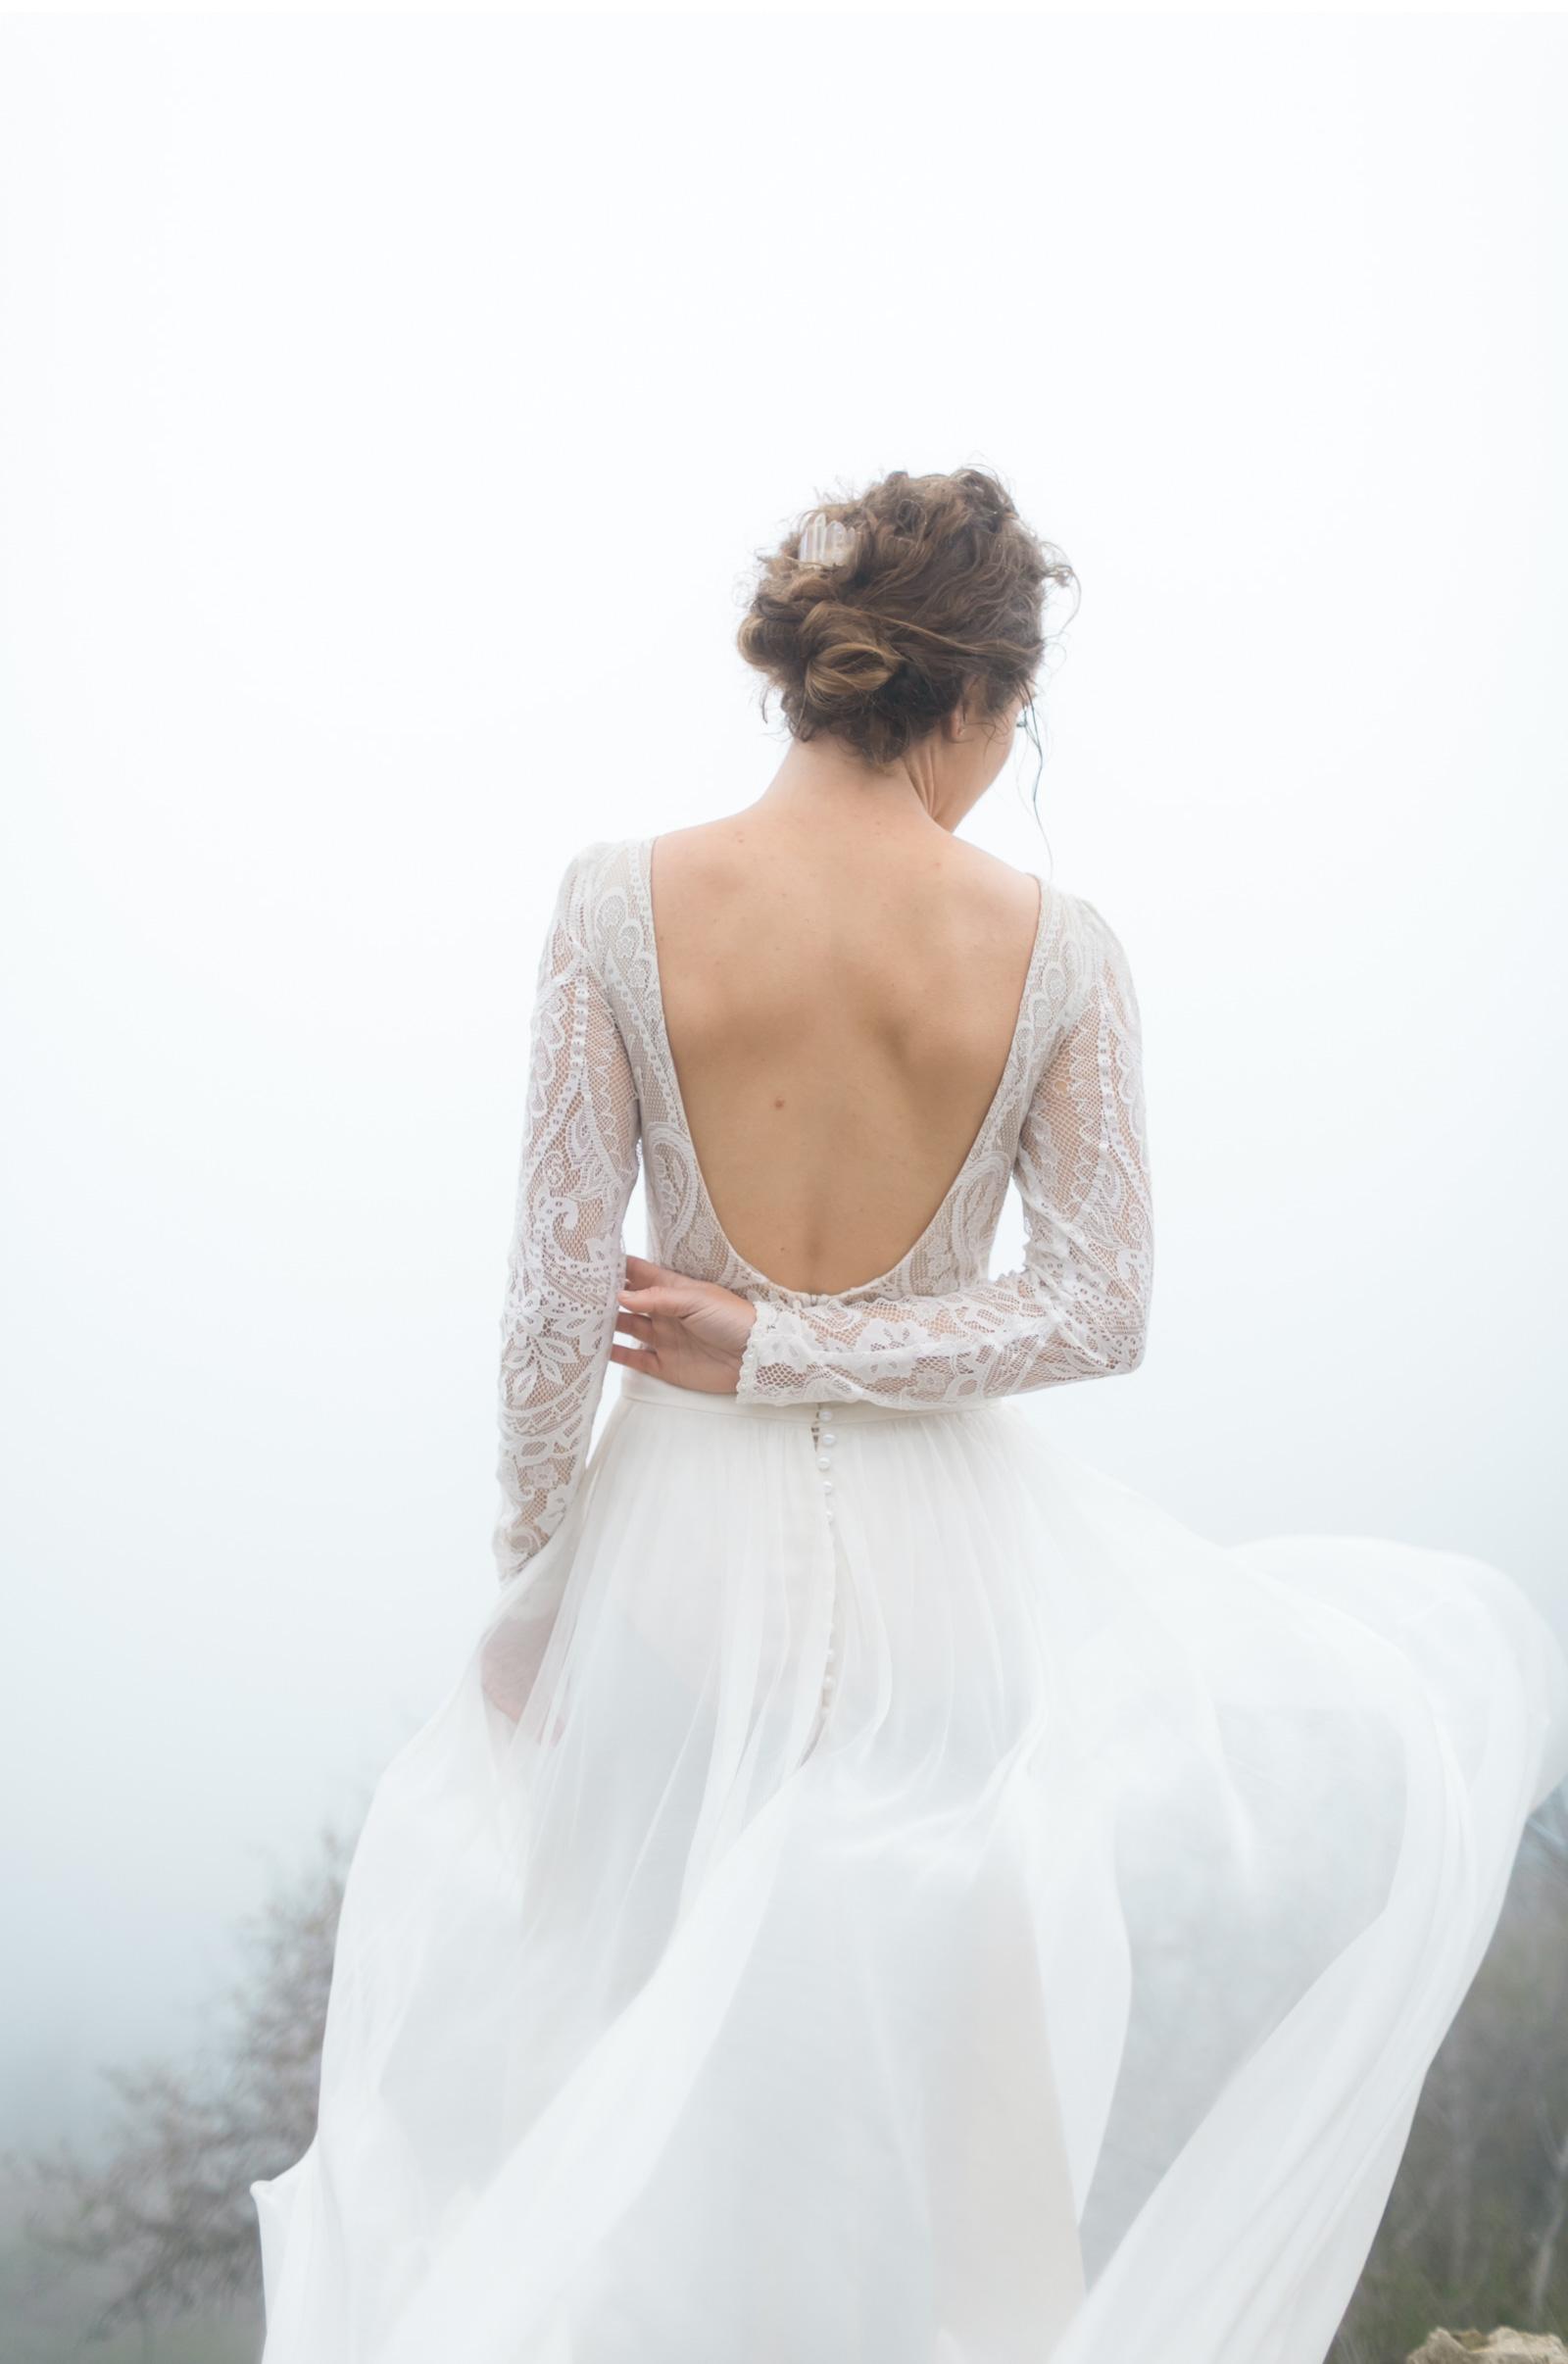 Knapps-Castle-Wedding-Natalie-Schutt-Photography_09.jpg